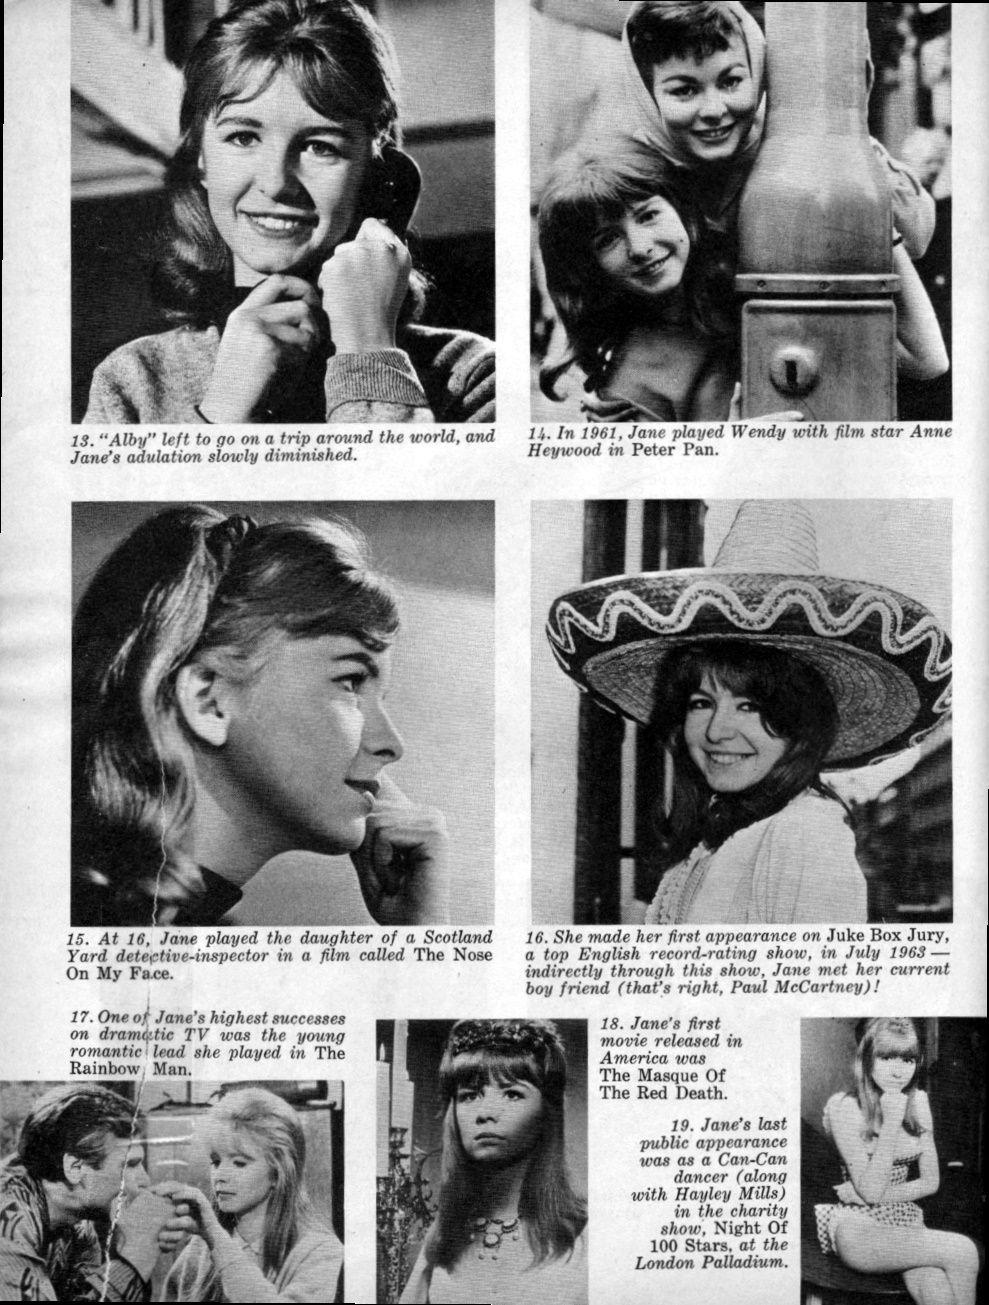 Jane Asher - 16 Magazine - March, 1965